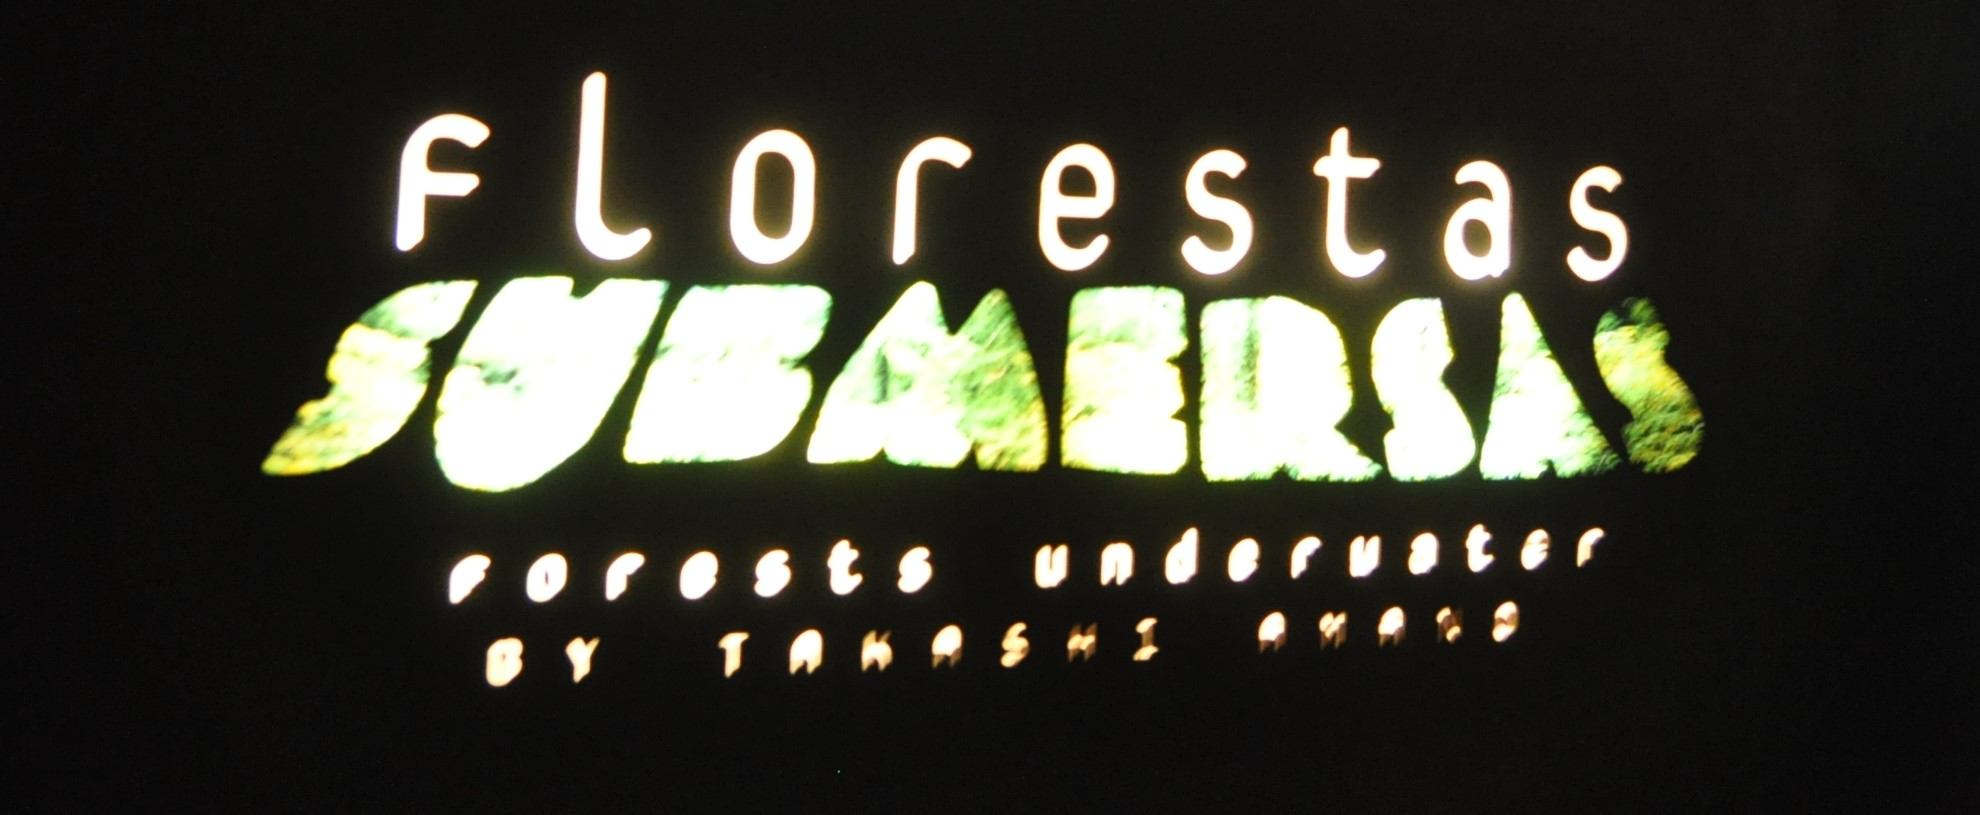 florestas submersas